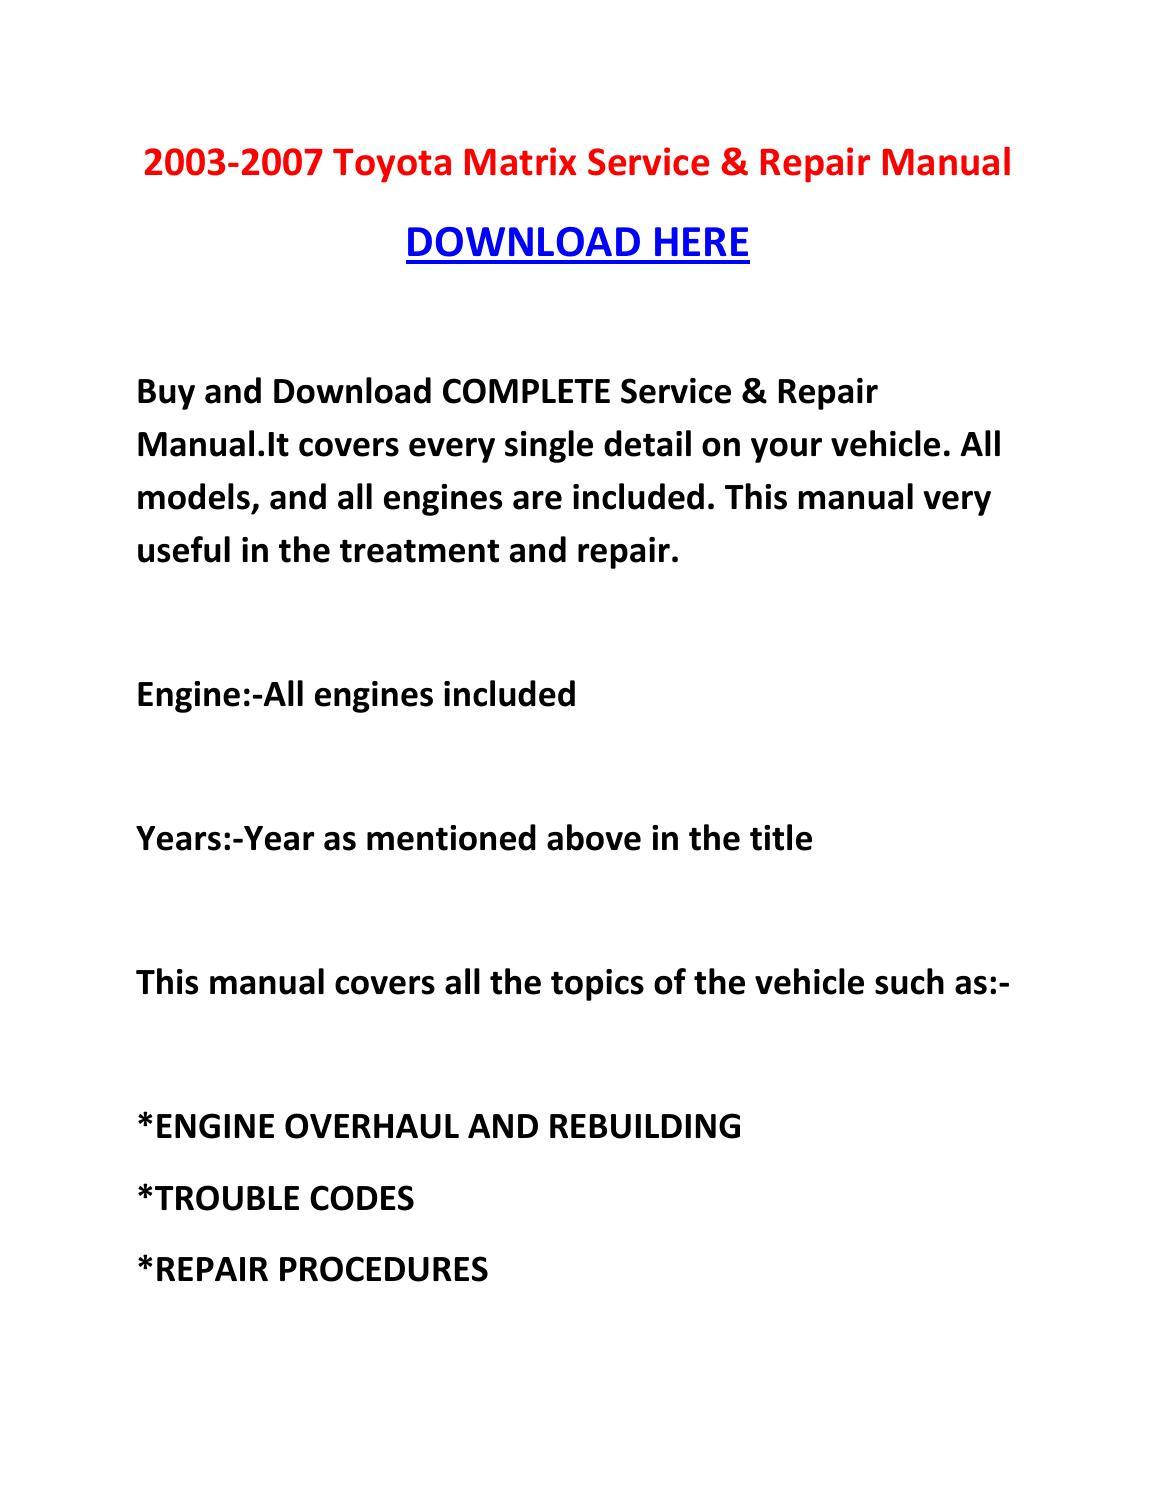 Toyota Matrix Service Manual Download